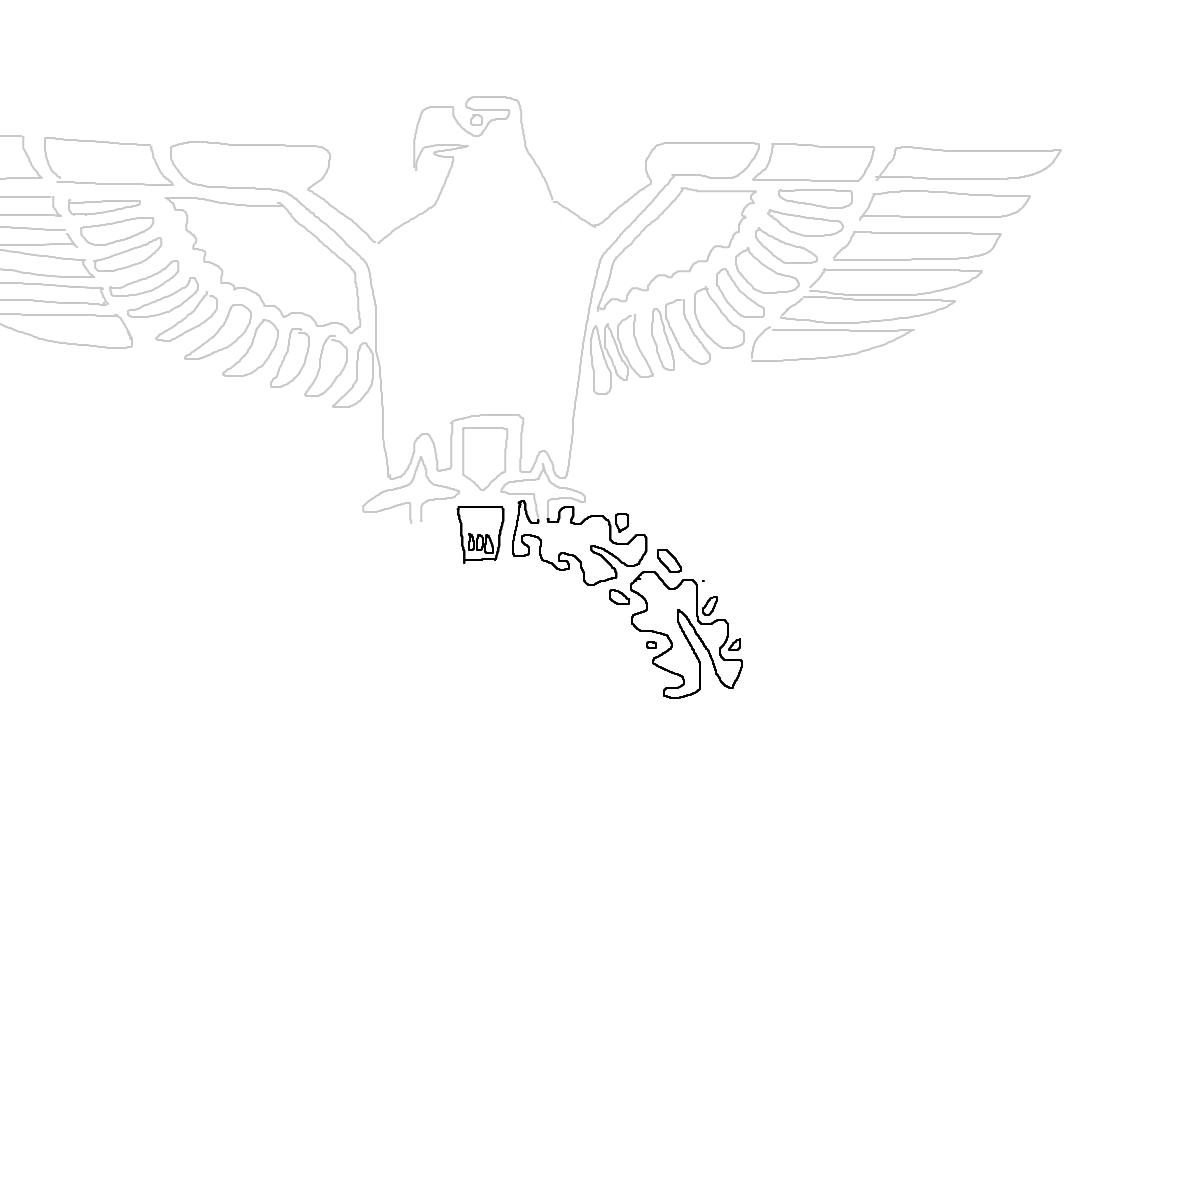 BAAAM drawing#19141 lat:60.3900680541992200lng: 25.6671028137207030